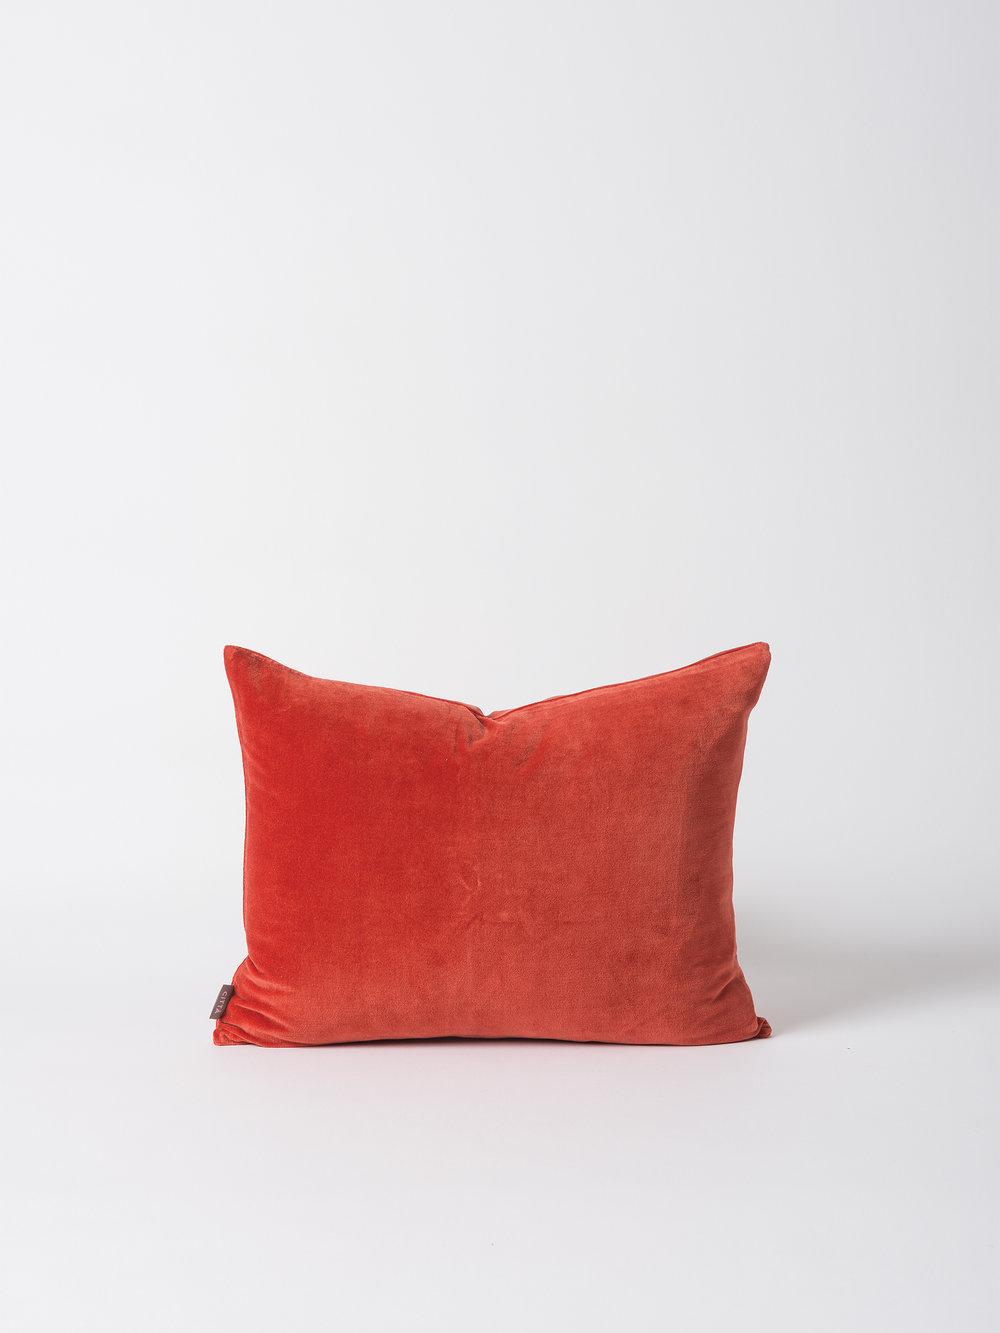 Cotton Velvet Cushion Cover - Carmine From $39.90